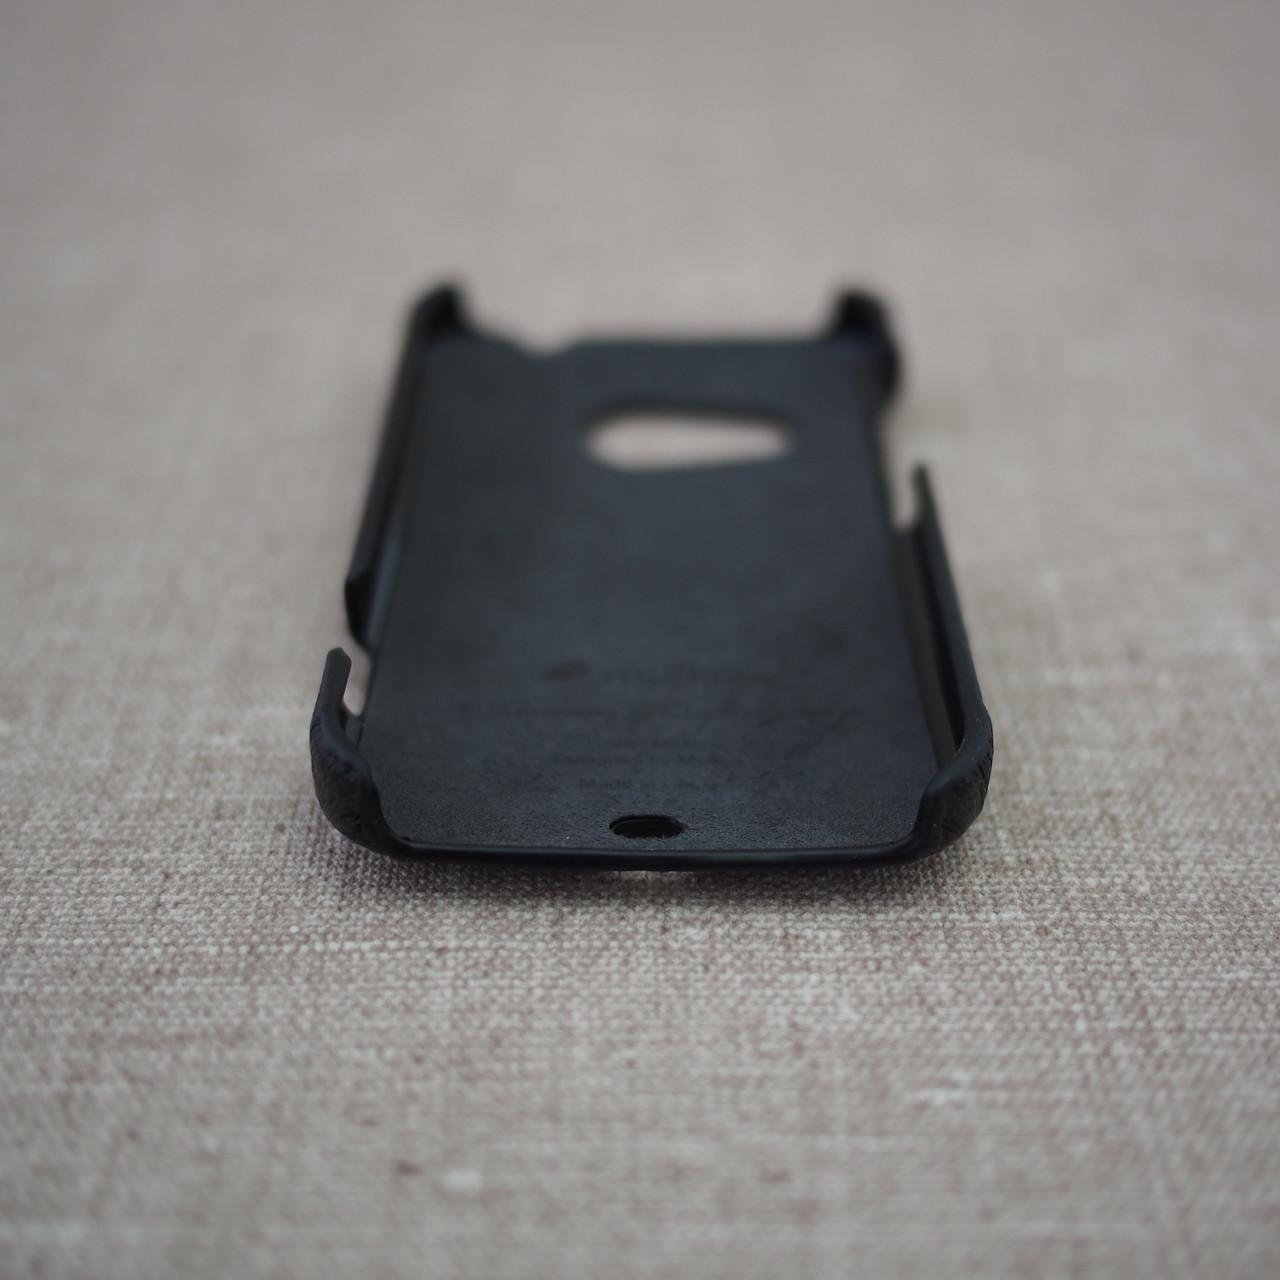 Melkco Snap Cover HTC Desire 200 black